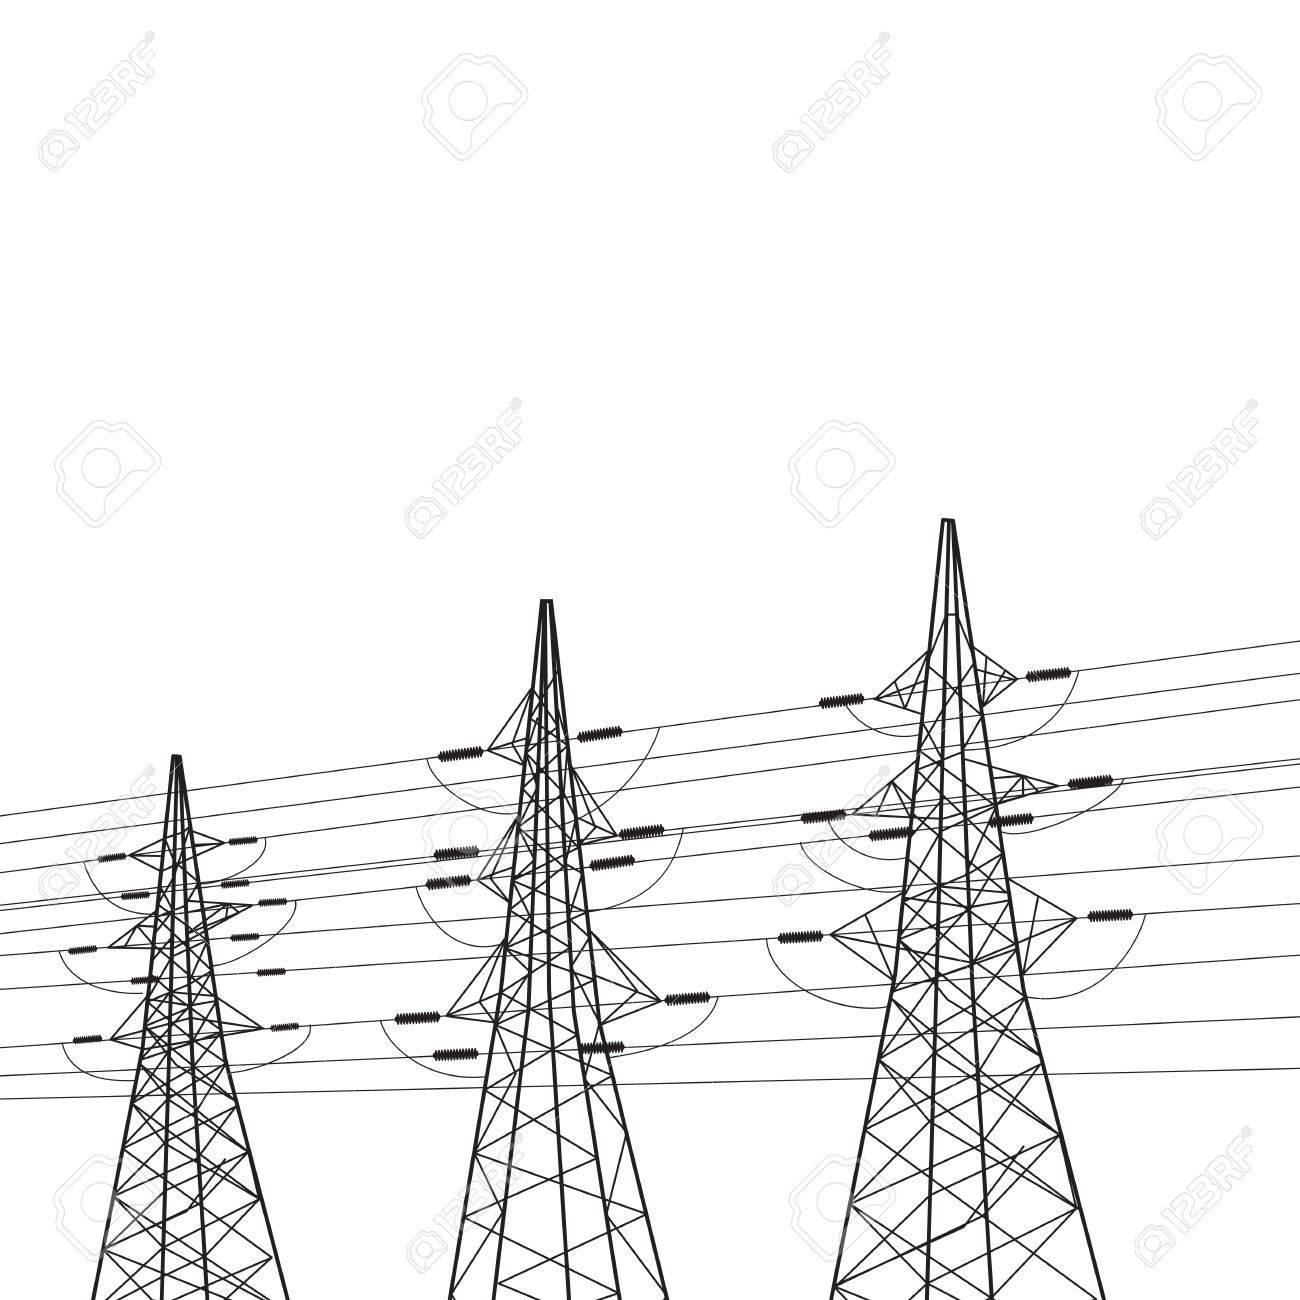 Electricity pole over white illustration Stock Illustration - 20875970